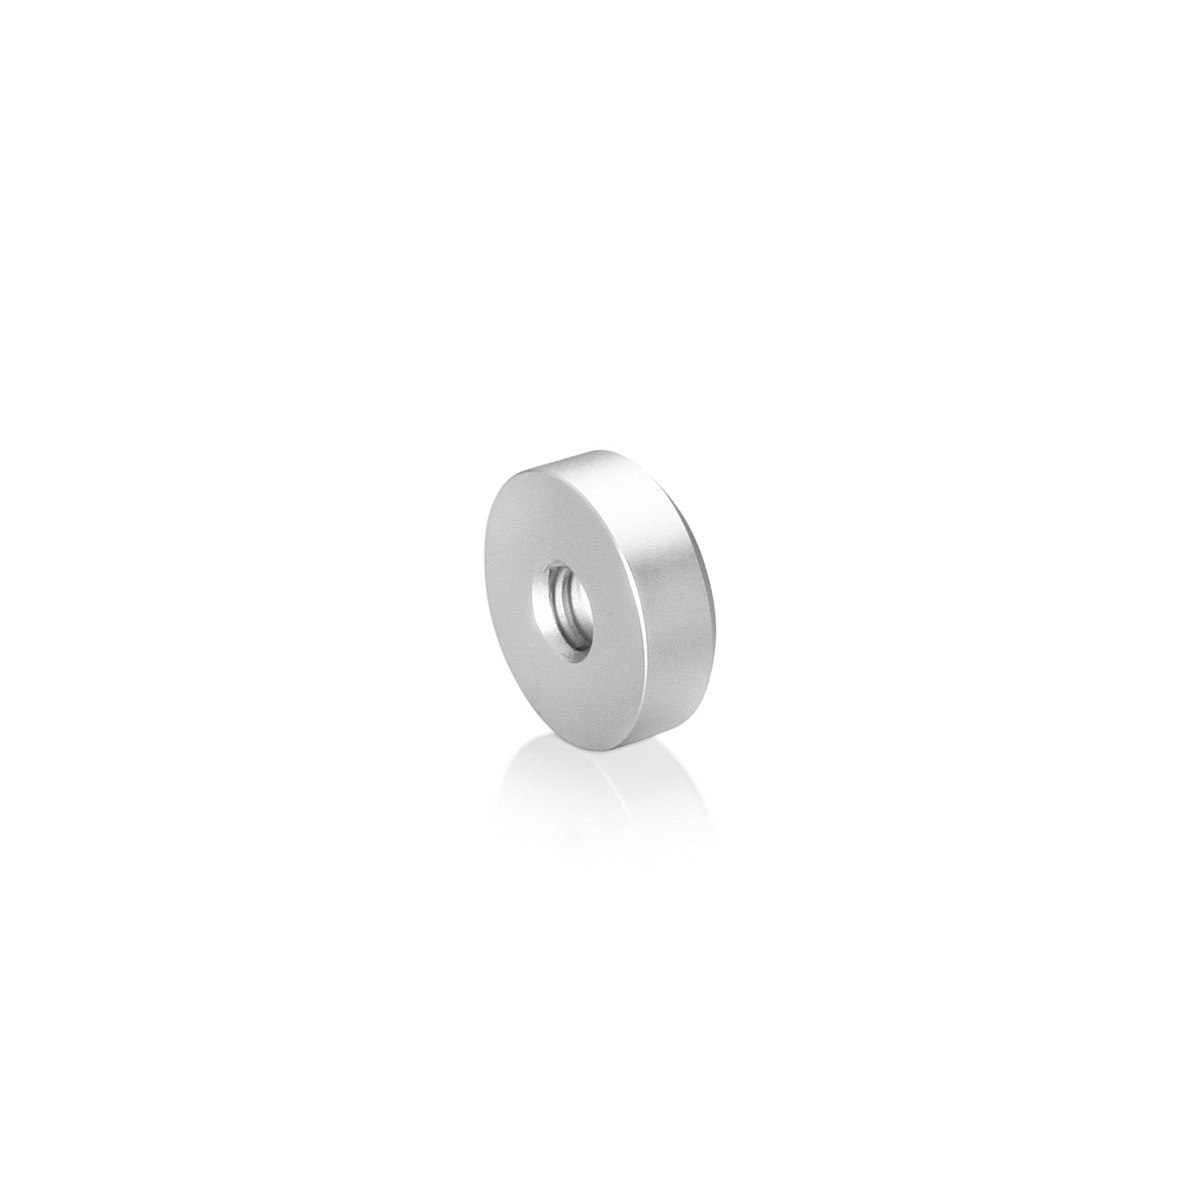 1/4-20 Threaded Caps Diameter: 3/4'', Height: 1/4'', Clear Anodized Aluminum